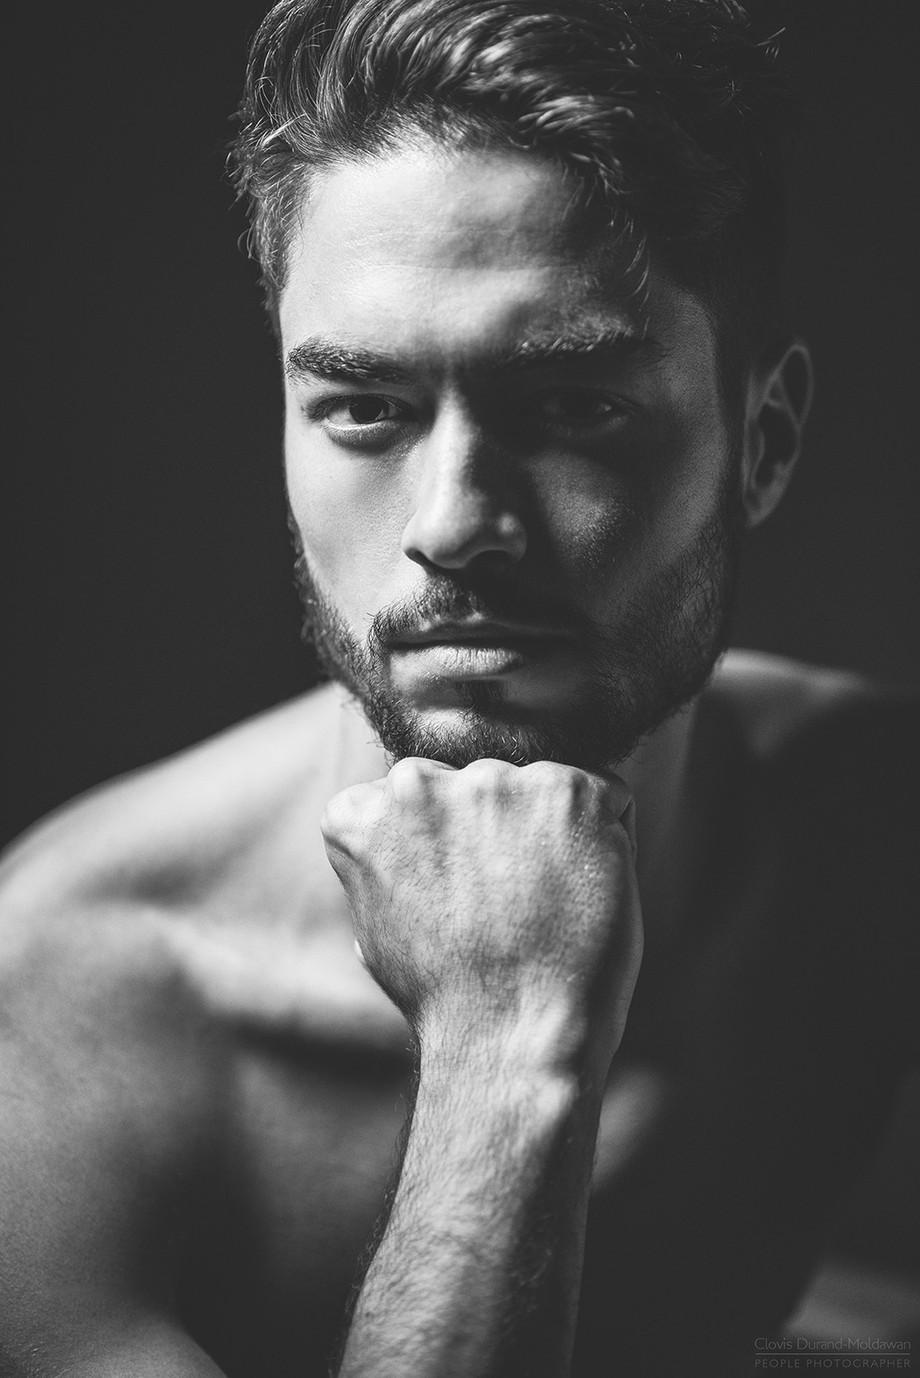 Trainee God by ClovisDM - The Face Of A Man Photo Contest